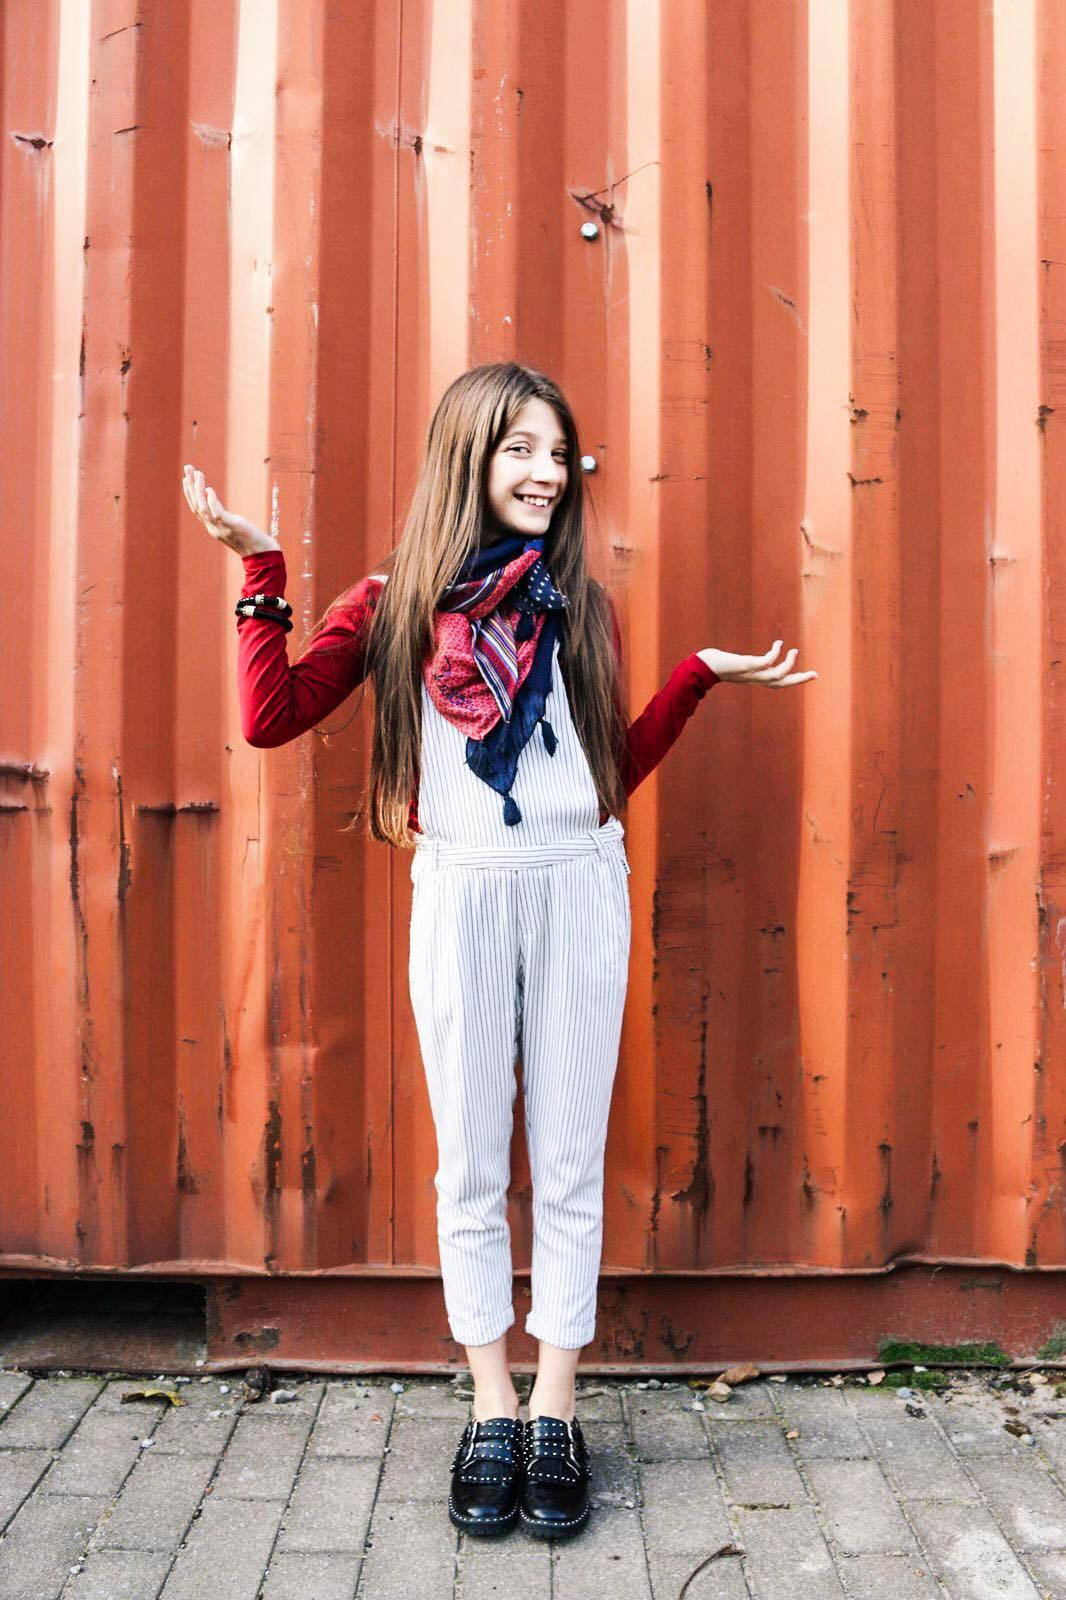 prix incroyable enfant grande qualité Shanna - foulards - foulards shanna - blog ...